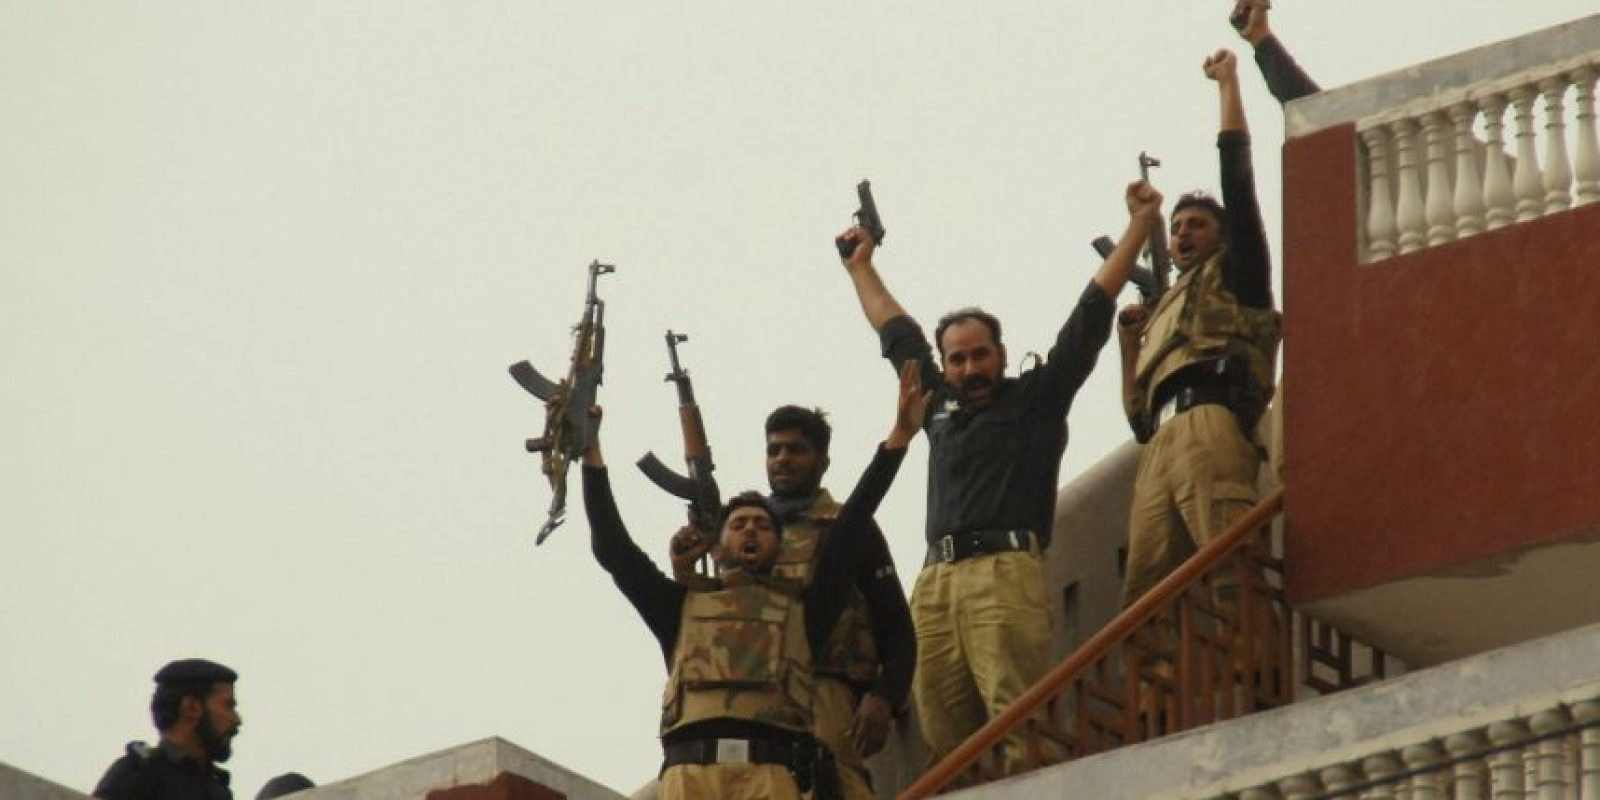 Estados Unidos le designó como organización terrorista en diciembre de 2012. Foto:Getty Images